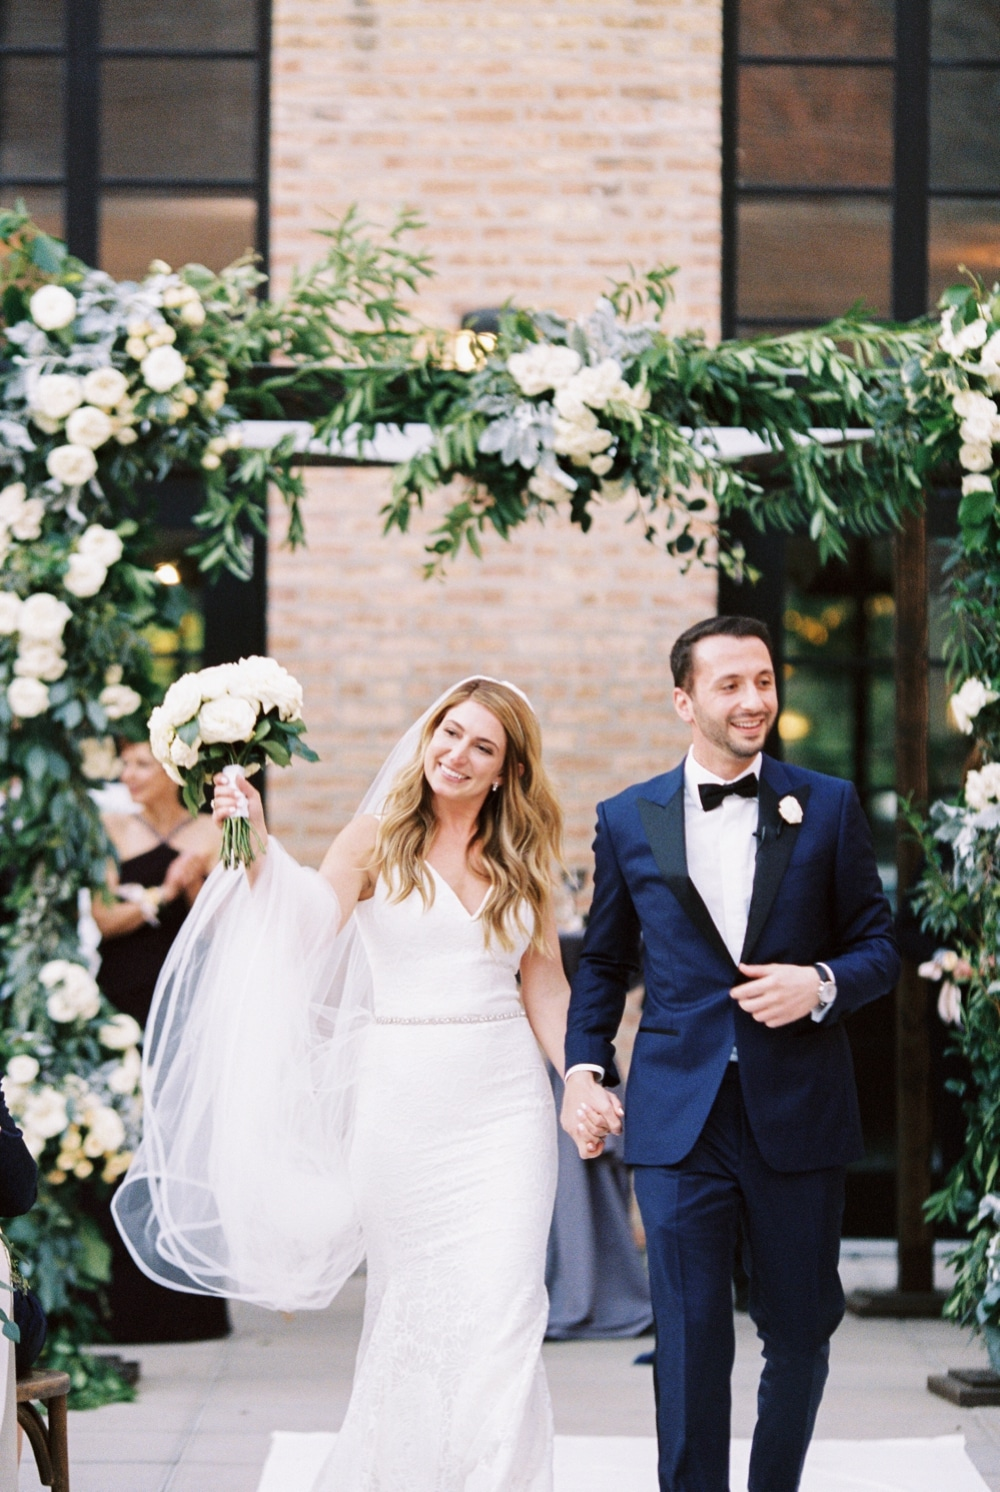 kristin-la-voie-photography-revel-motor-row-chicago-wedding-photographer-170